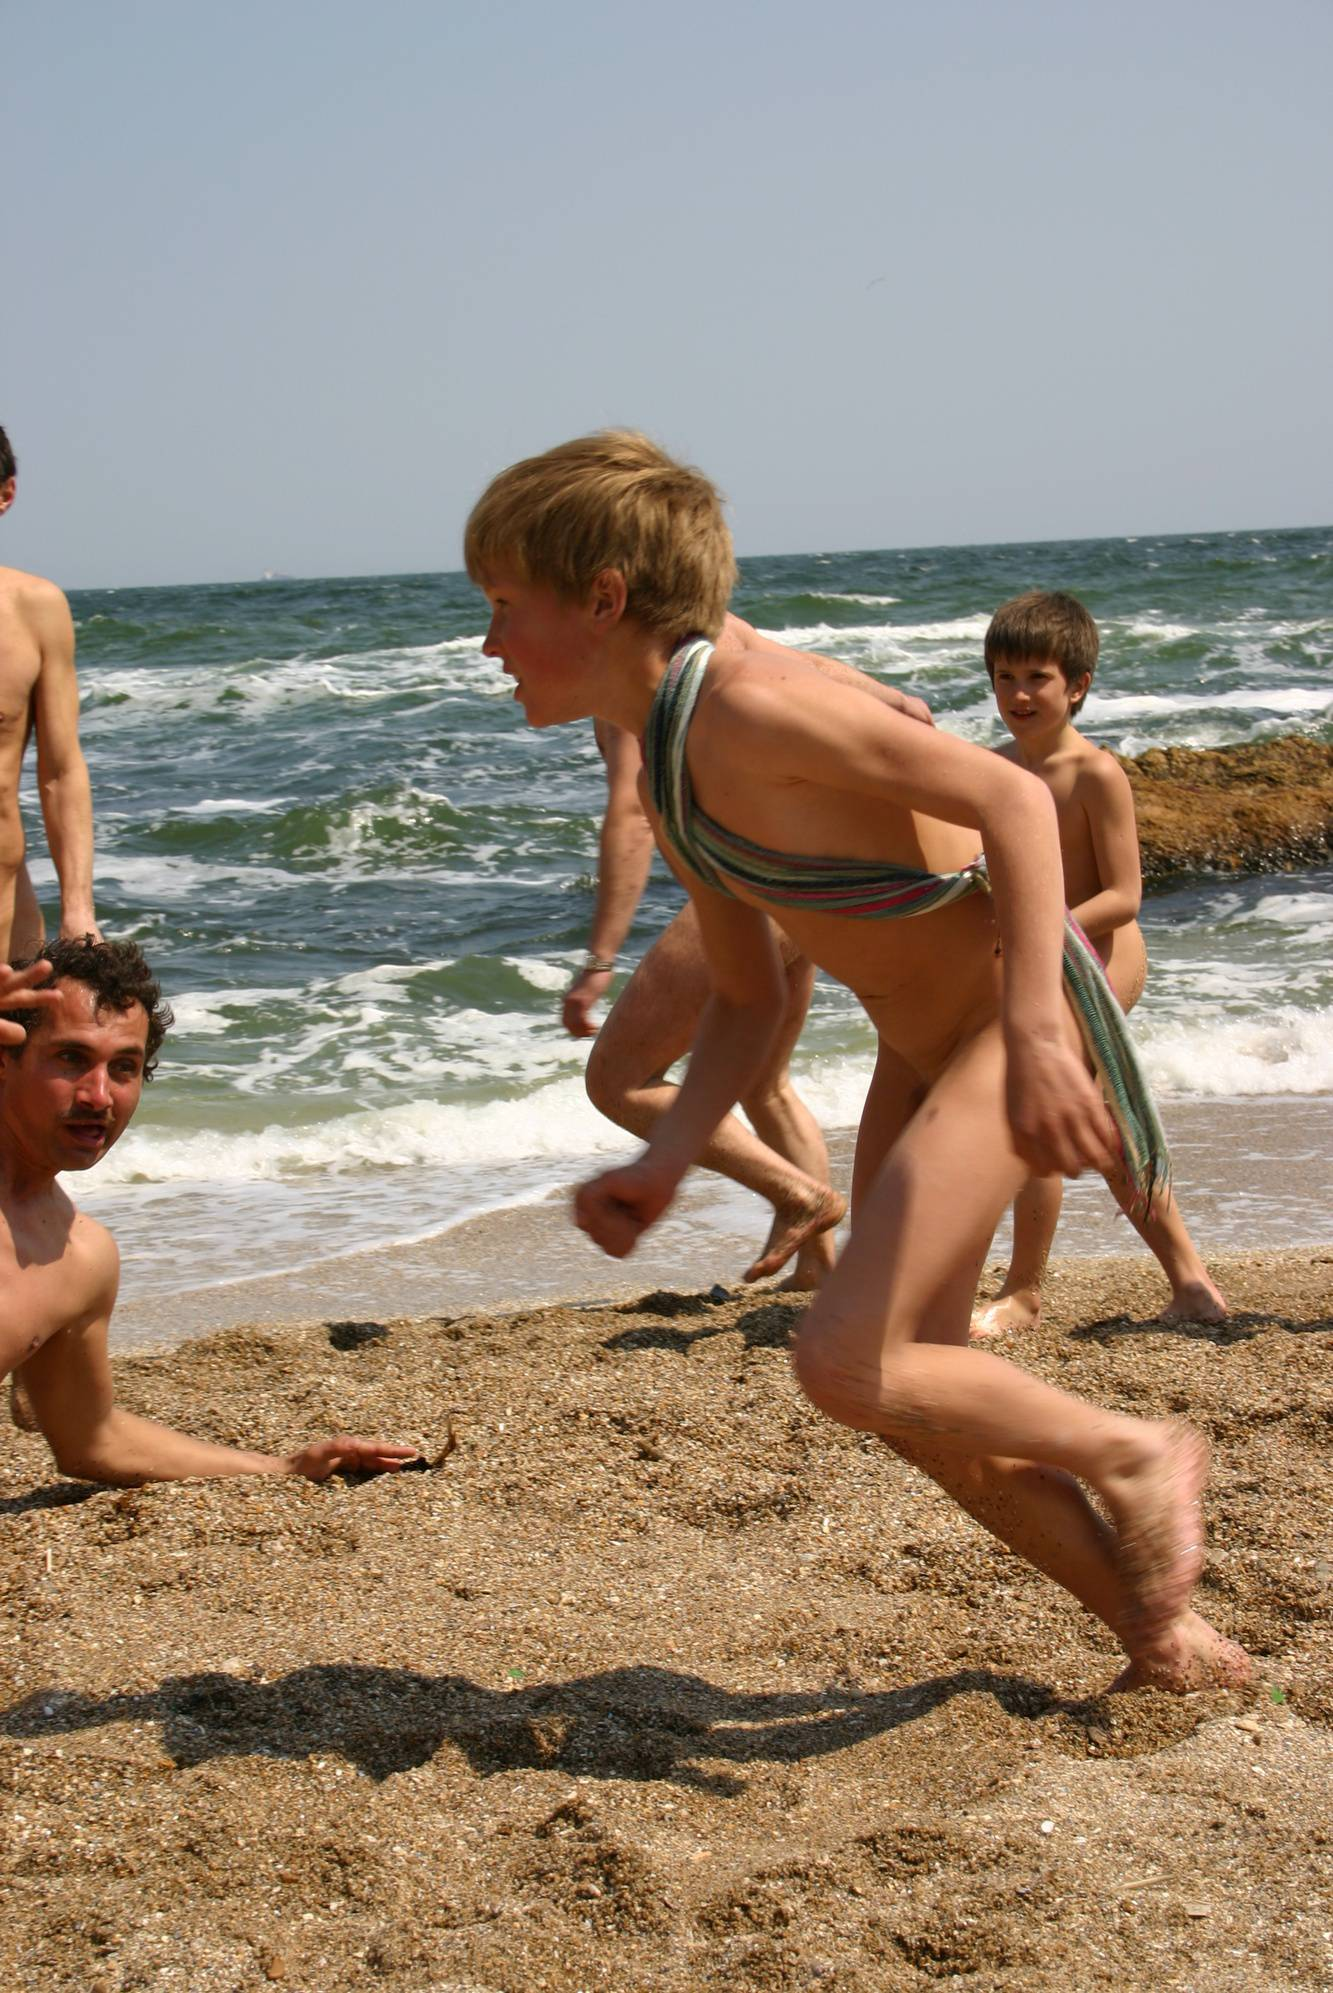 Nudist Families of the Sea - 2